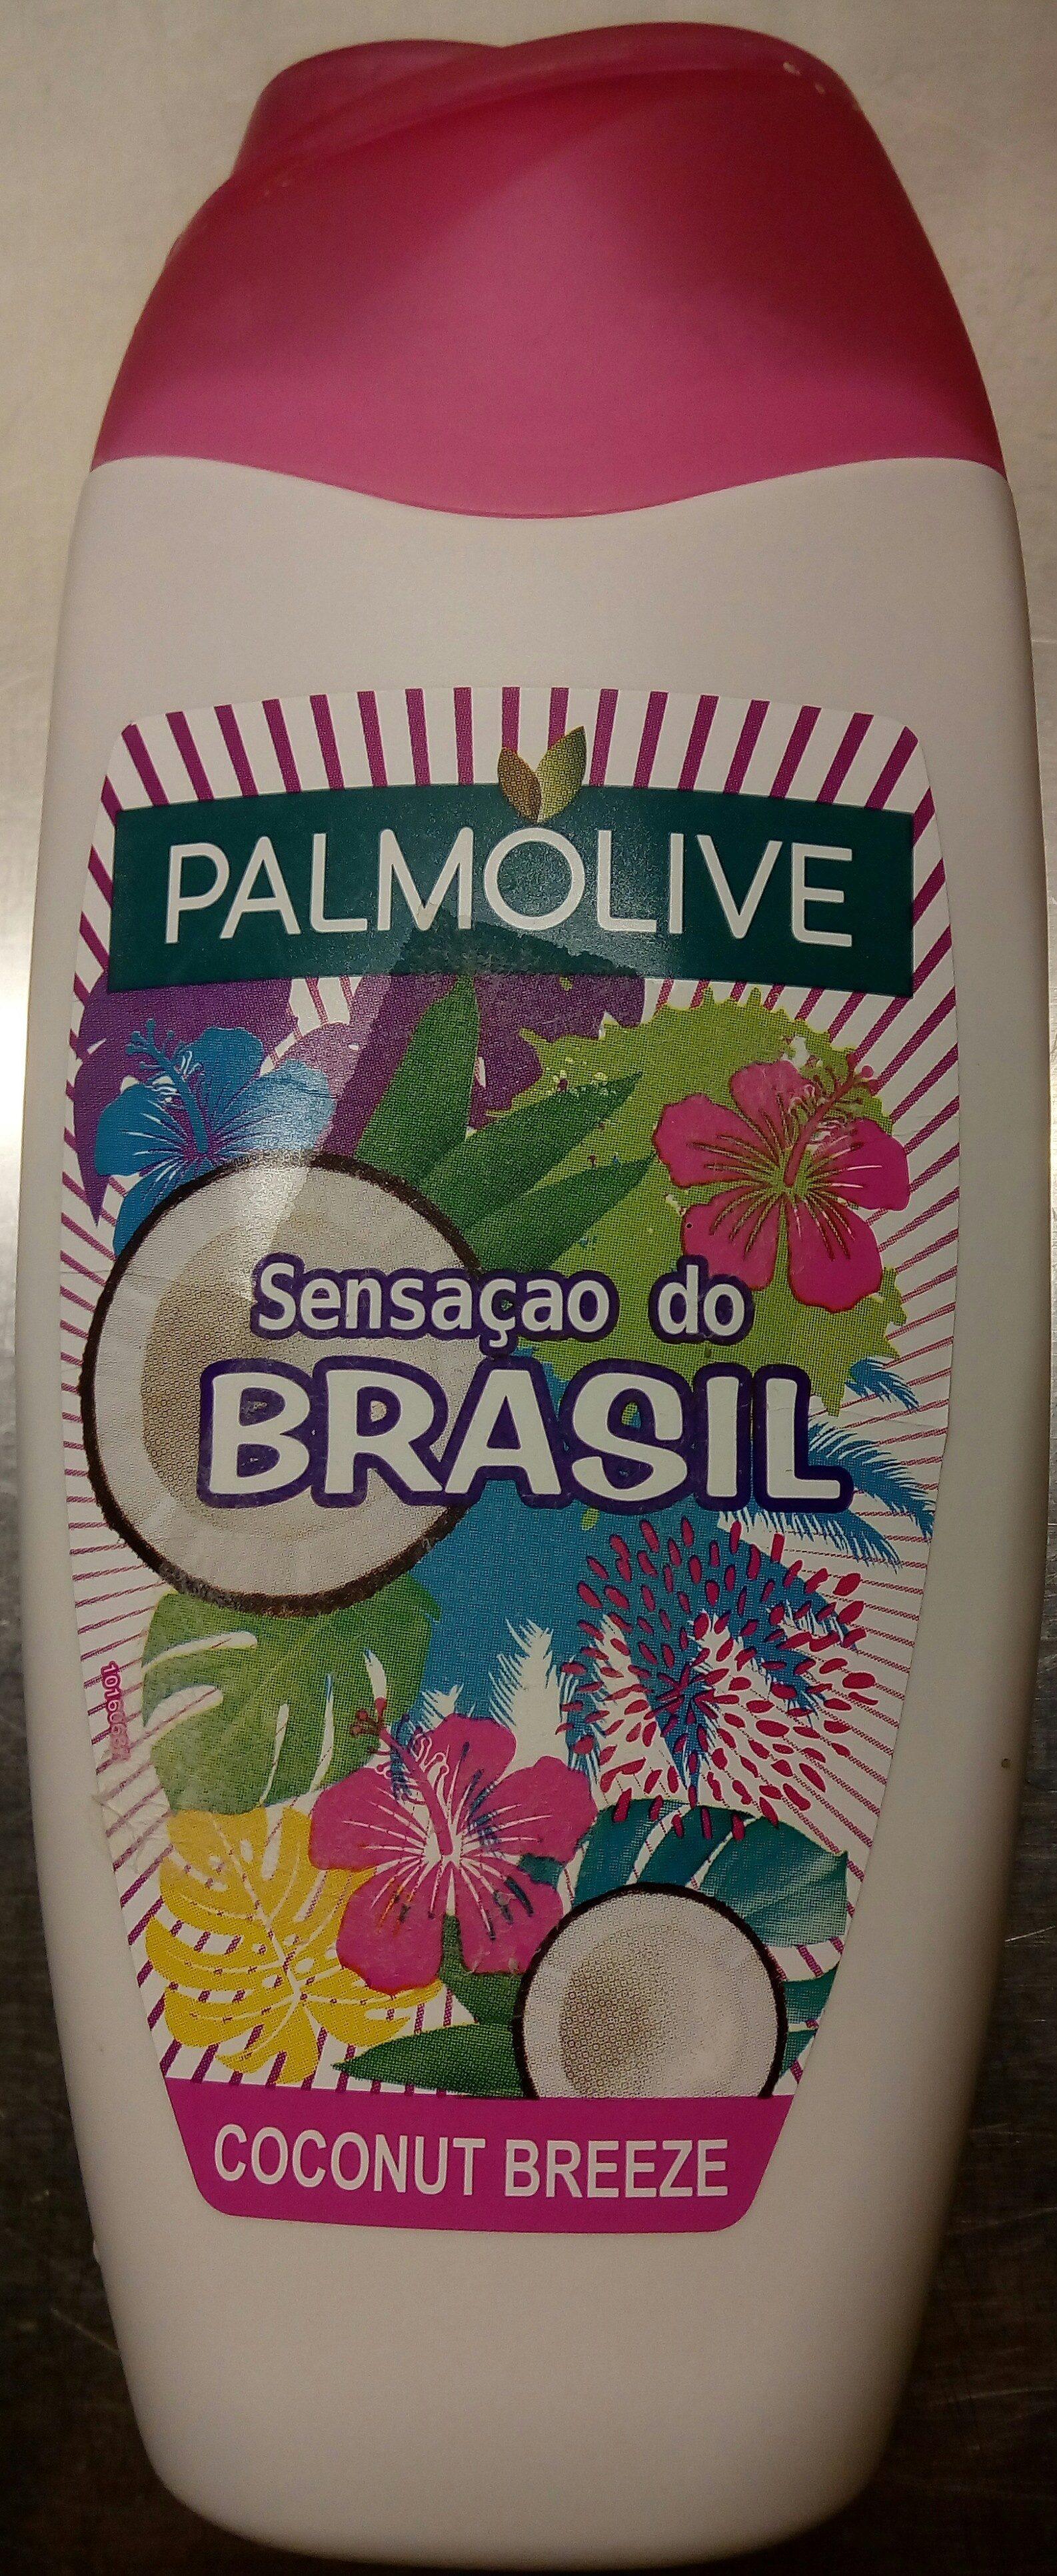 Palmolive Sensaçao do Brasil Coconut Breeze - Продукт - en